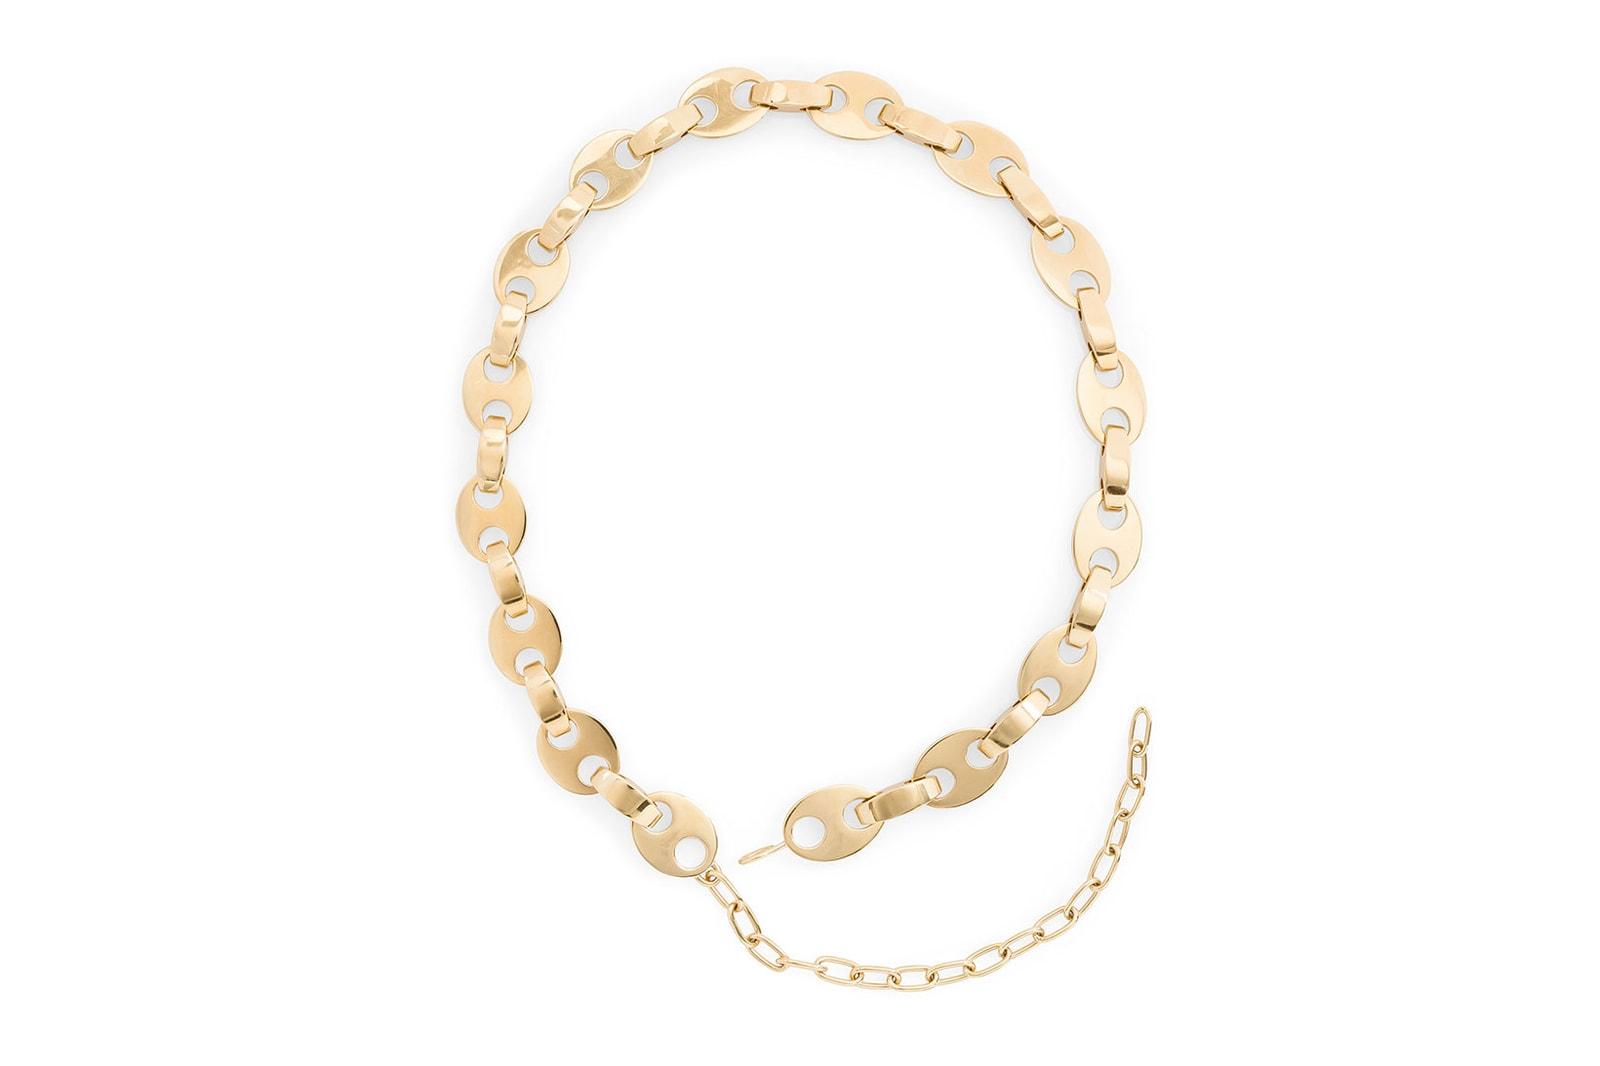 paco rabanne valentine's day build love collection jewelry chain necklace bracelet handbag